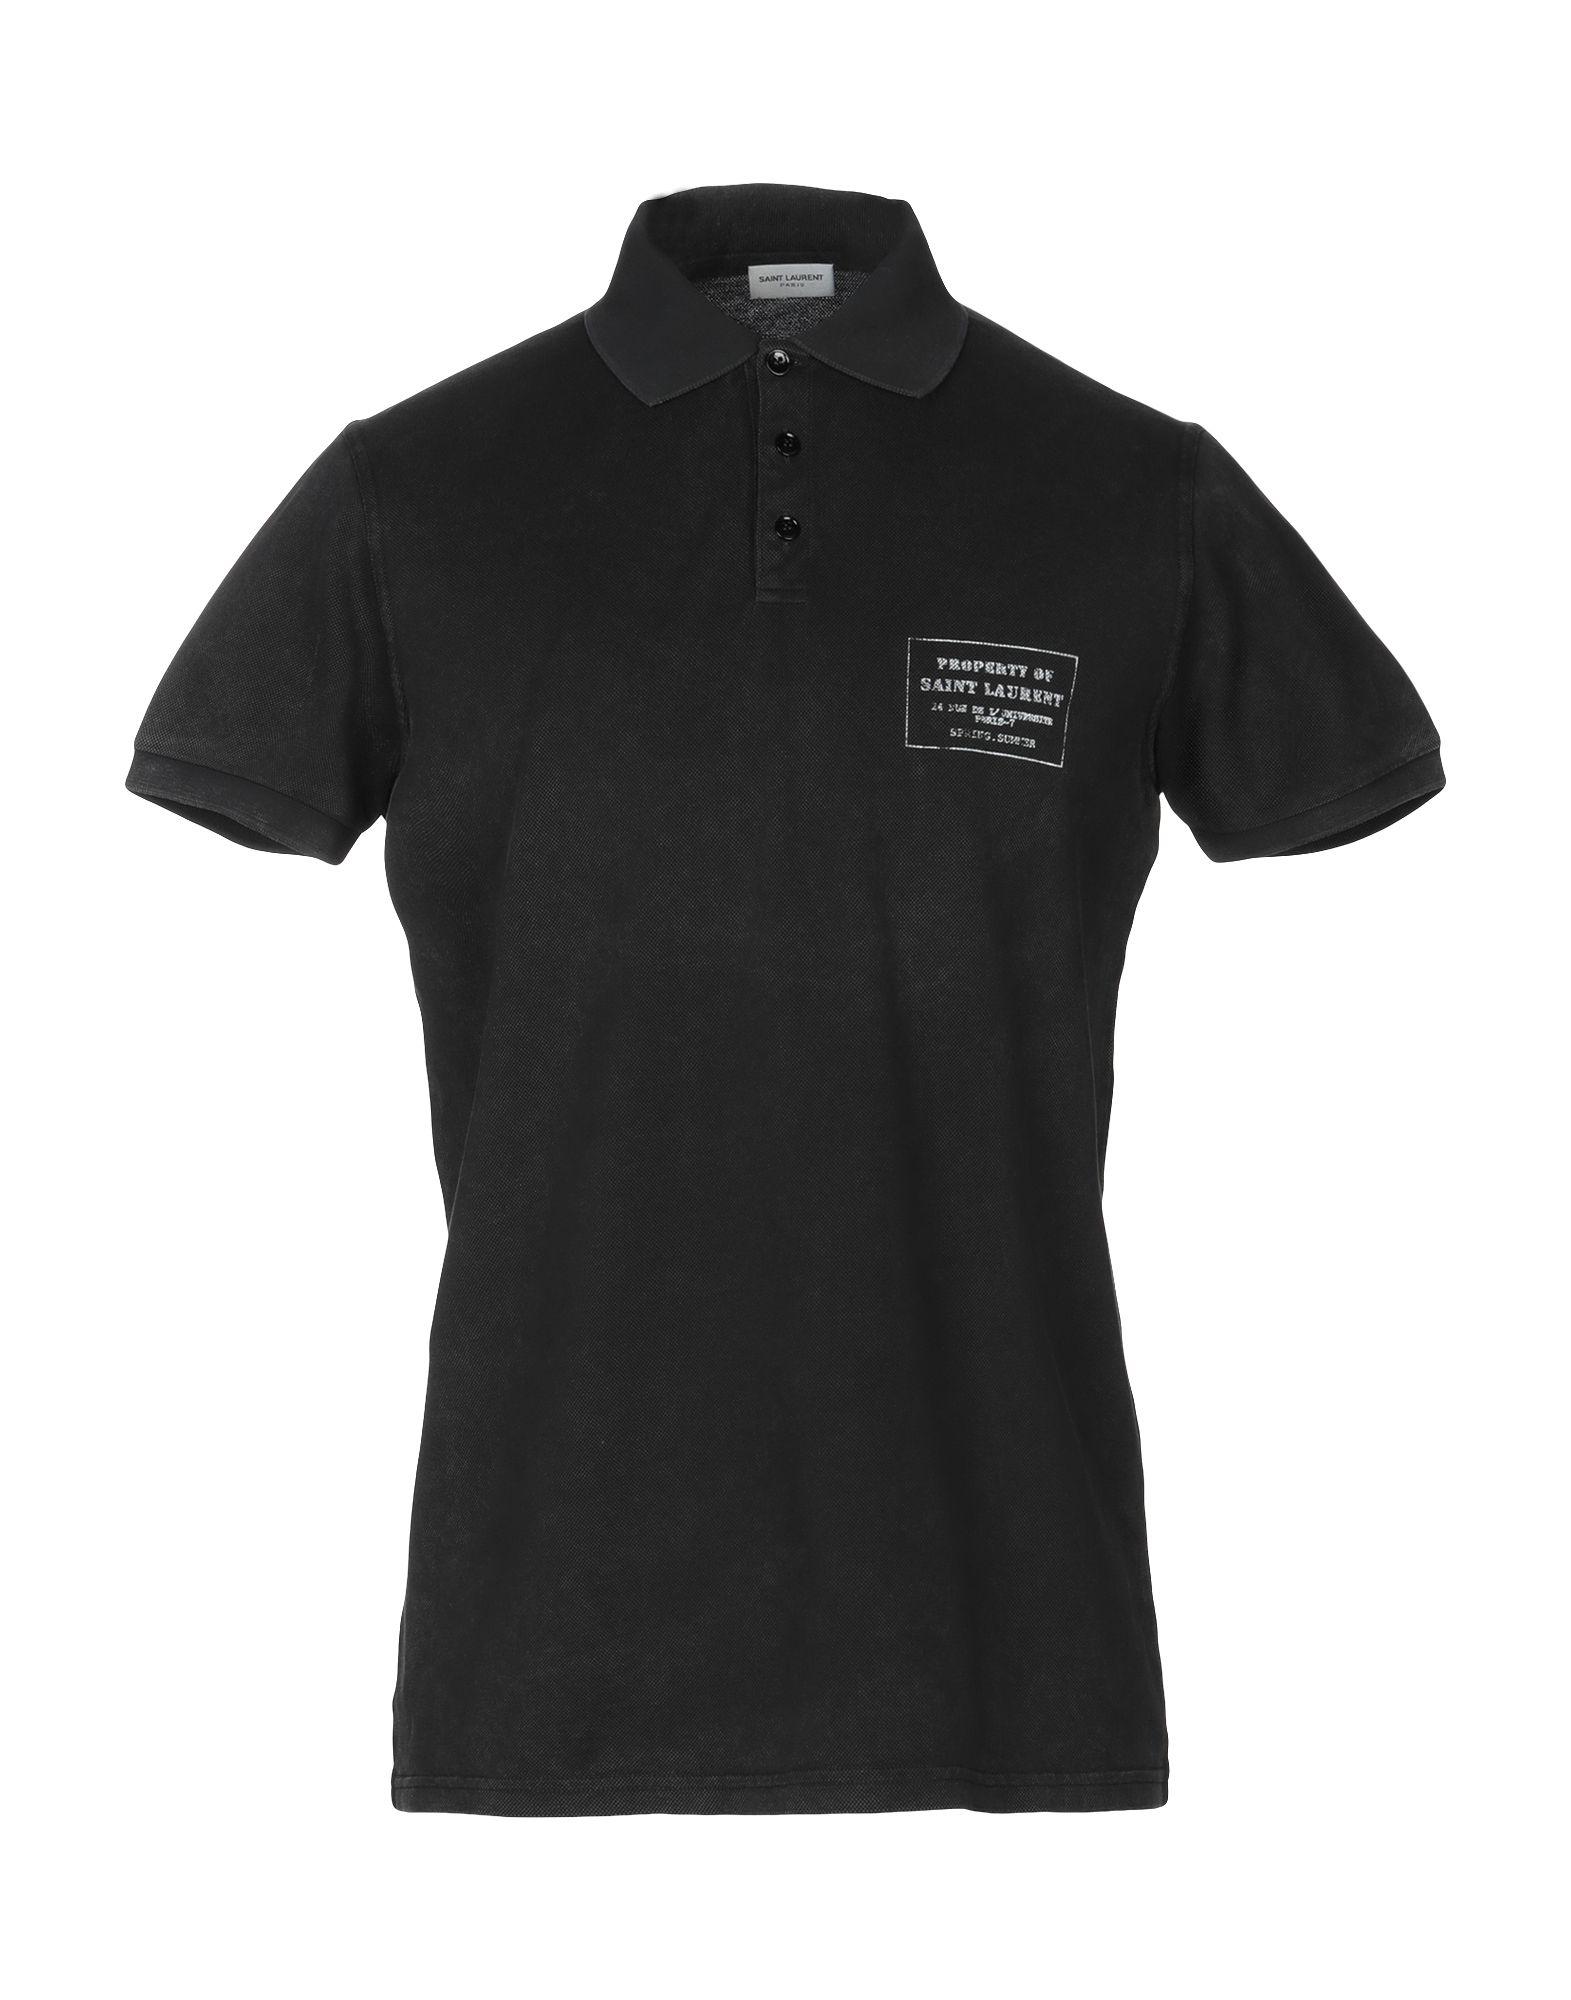 555b6a6ab41cda Saint Laurent Polo Shirt - Men Saint Laurent Polo Shirts online on YOOX  United States - 12250876LB